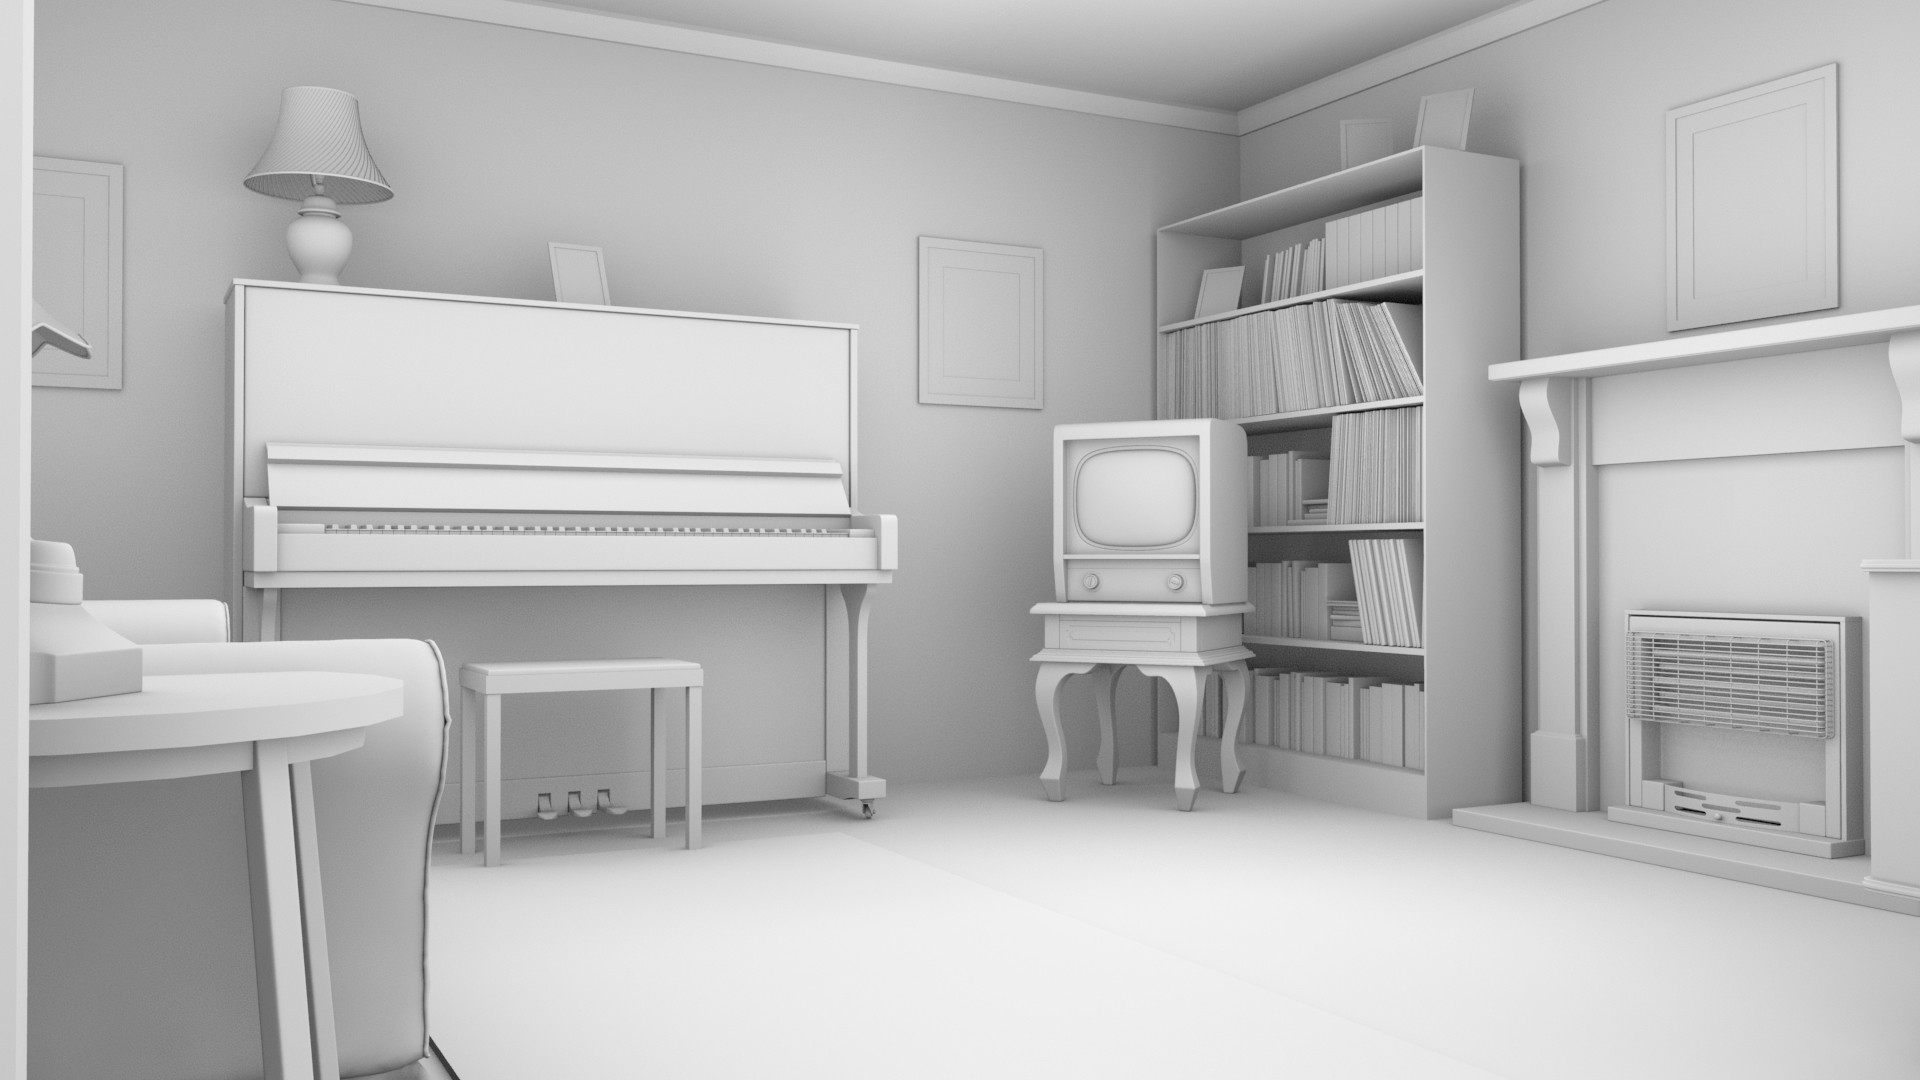 Alex Akins - WIP - \'Birthday\' film: 1960\'s Living Room Environment